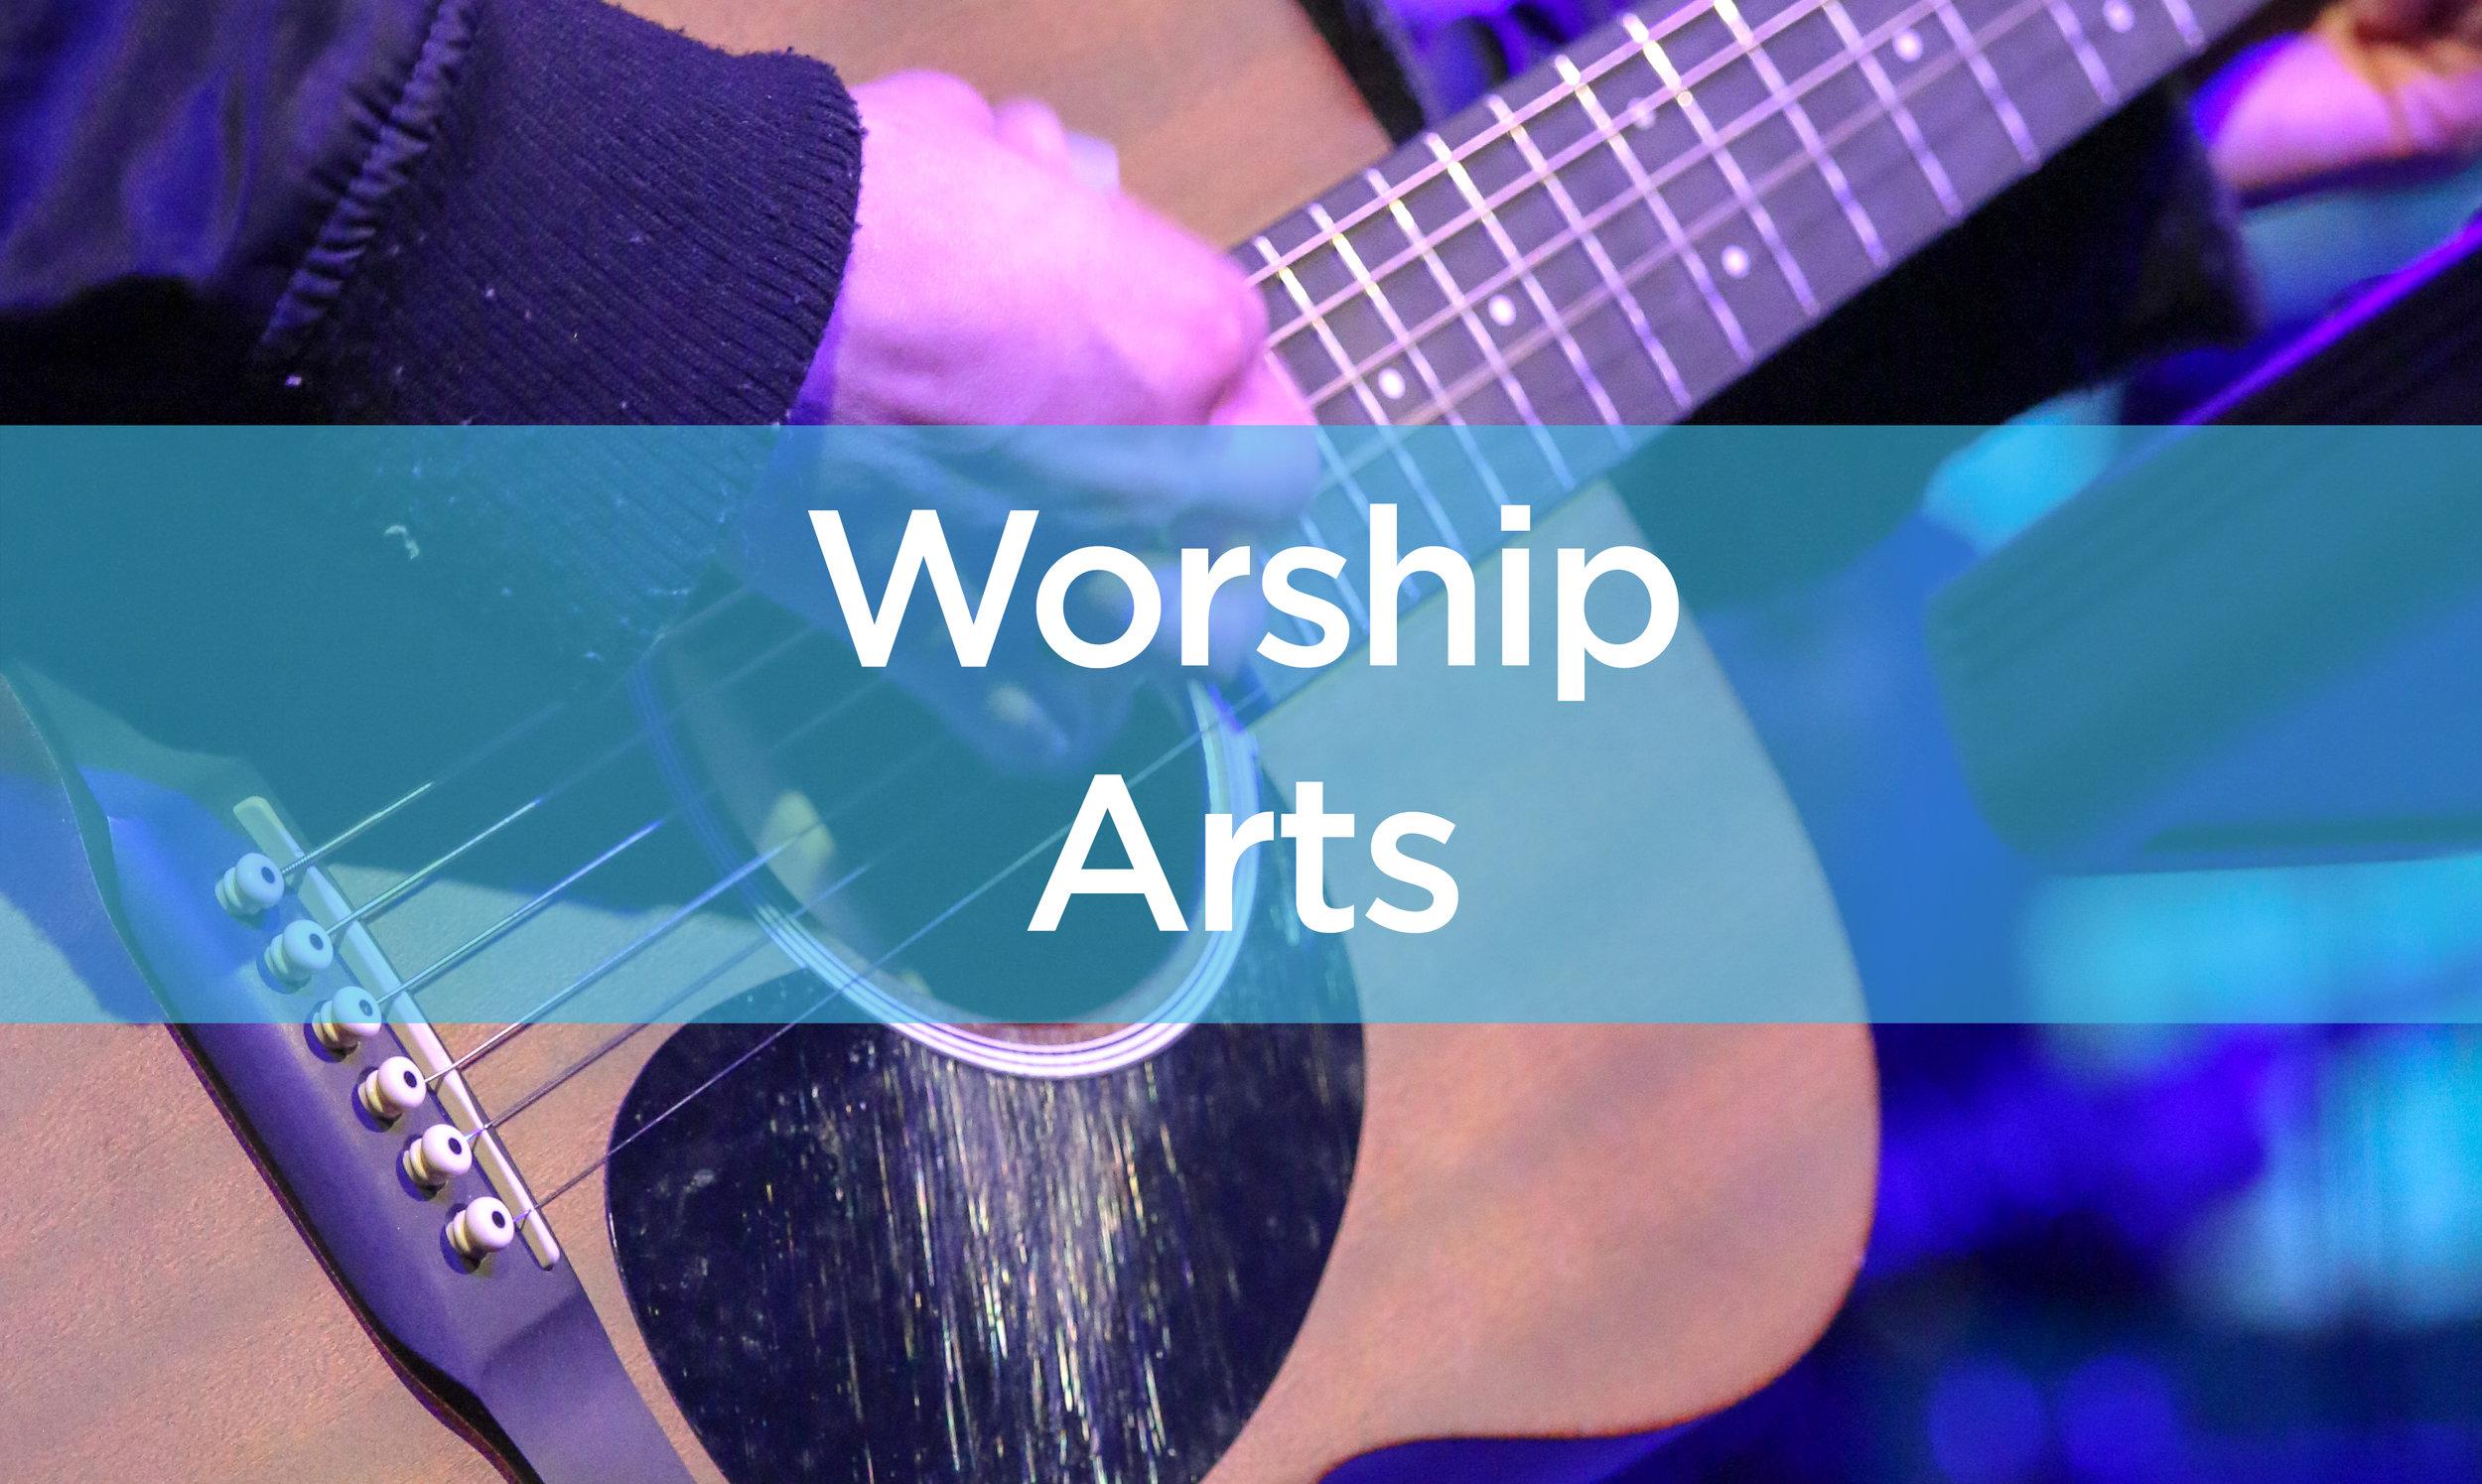 worship arts.jpg